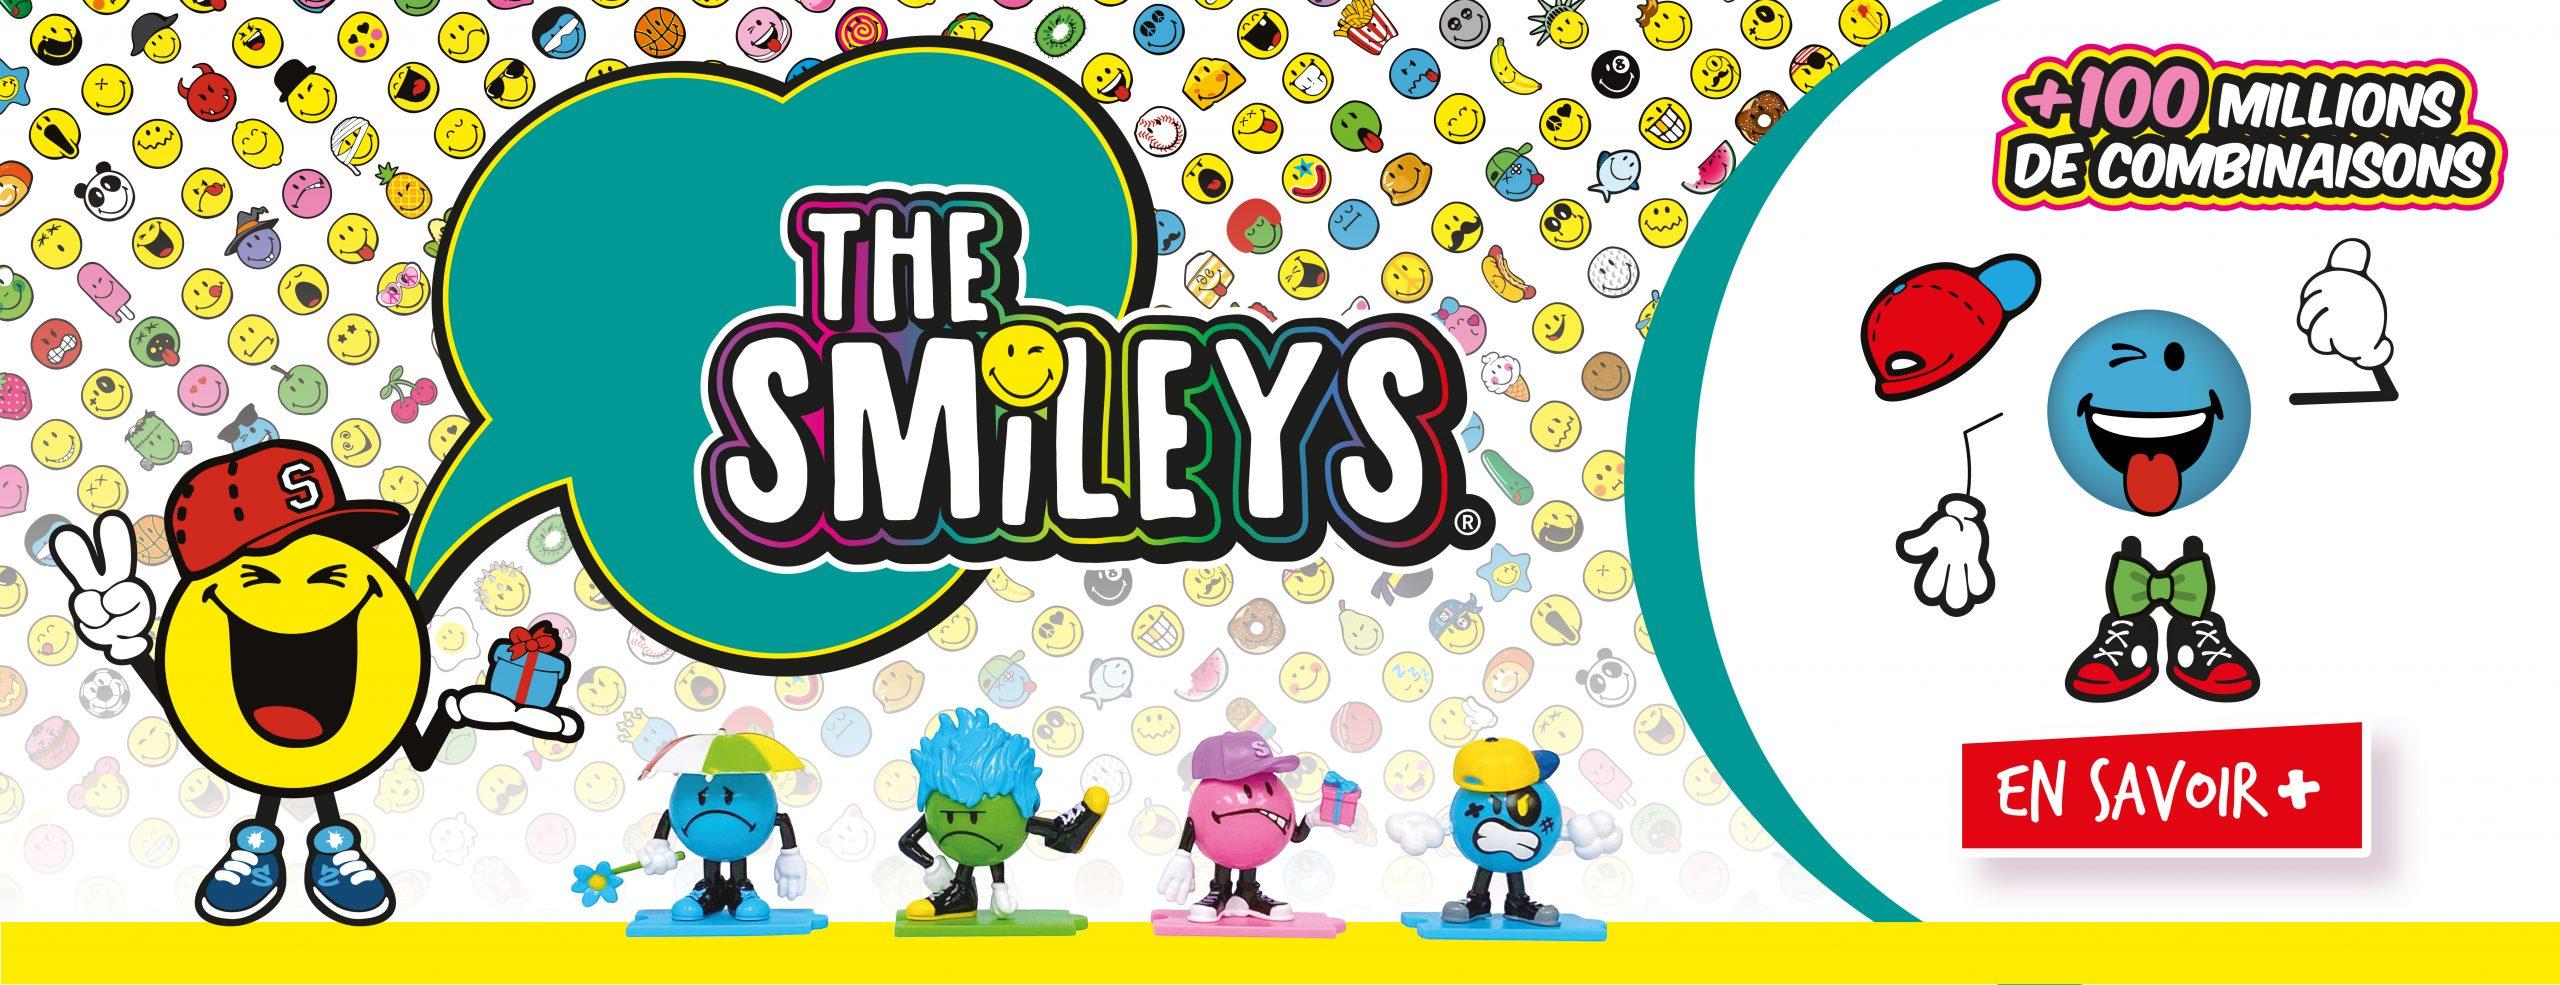 20-02-26_TheSmileys